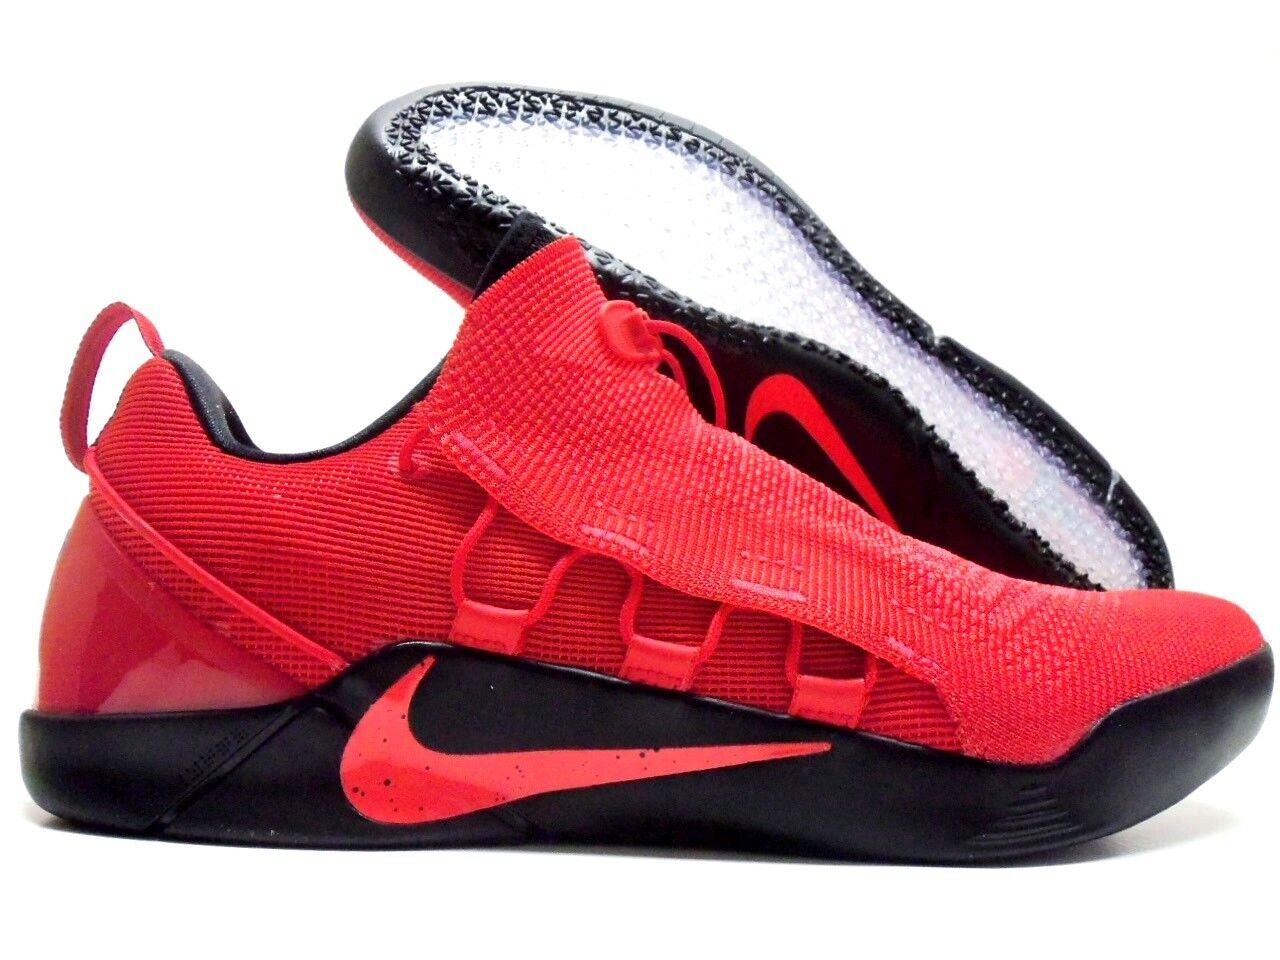 5ac0fd91290 Nike Kobe A.d. NXT Basketball Shoes Mens 14 Red Crimson 882049 600